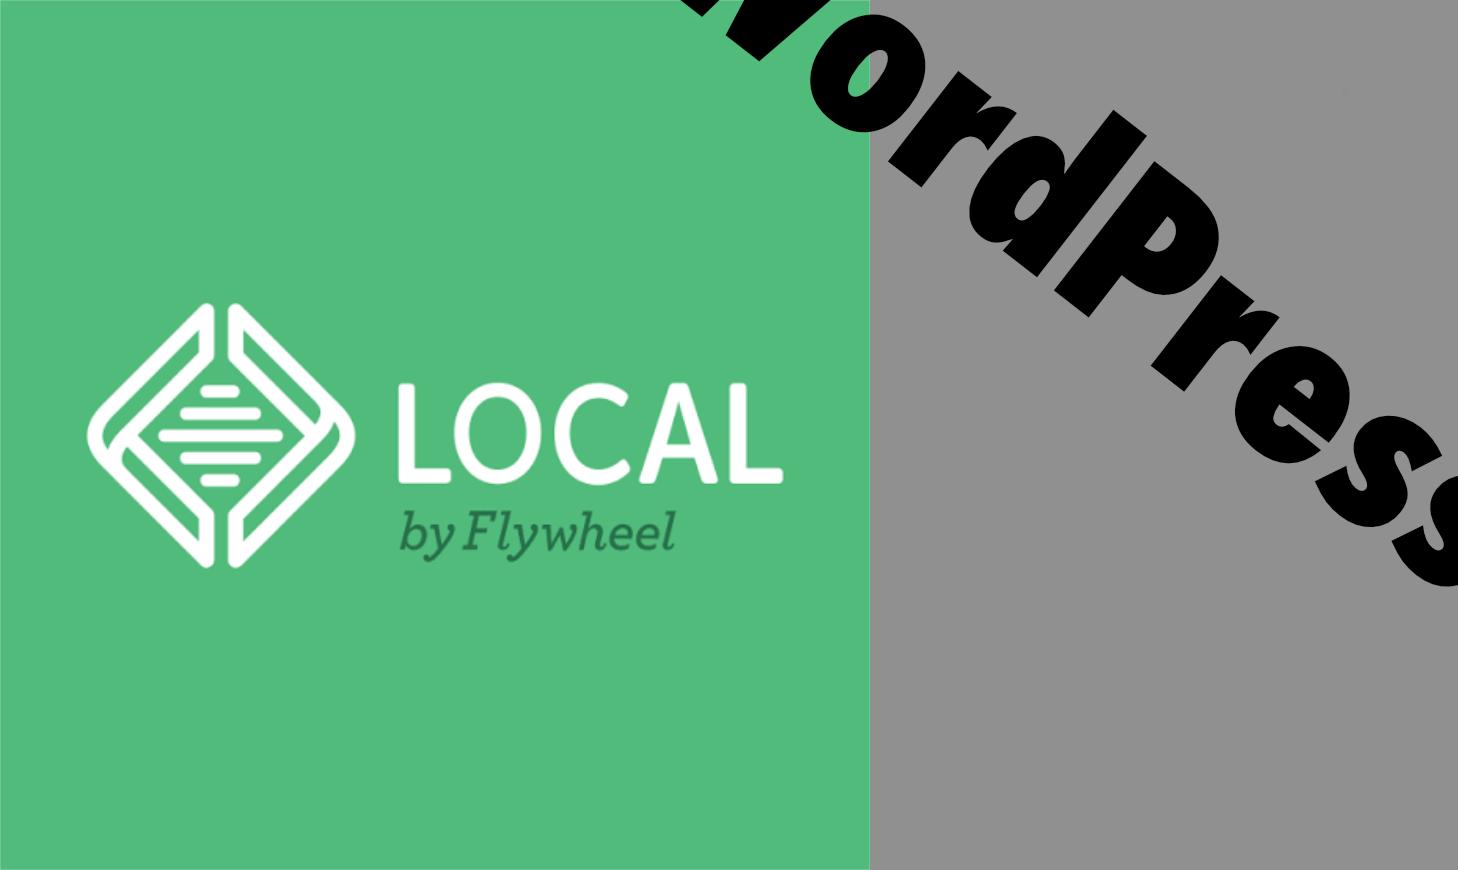 WordPressのローカル環境はこれで決まり【Local by flywheel】